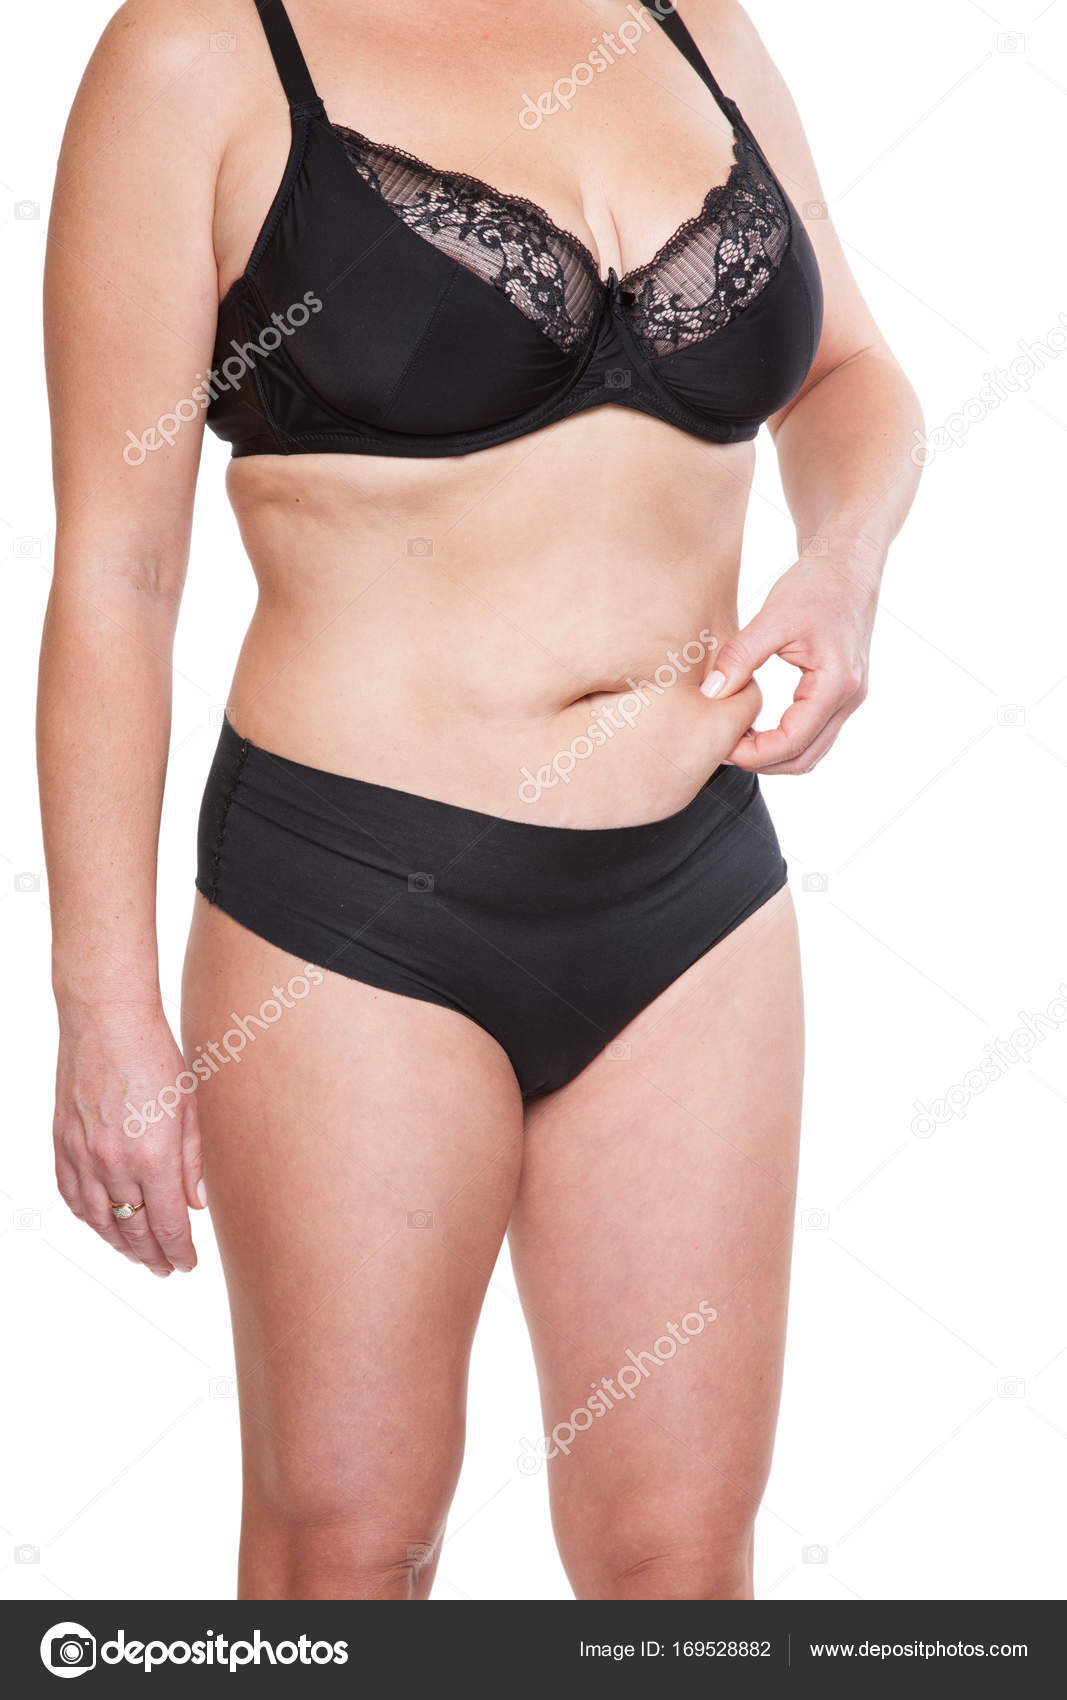 Chubby woman pinching belly– stock image